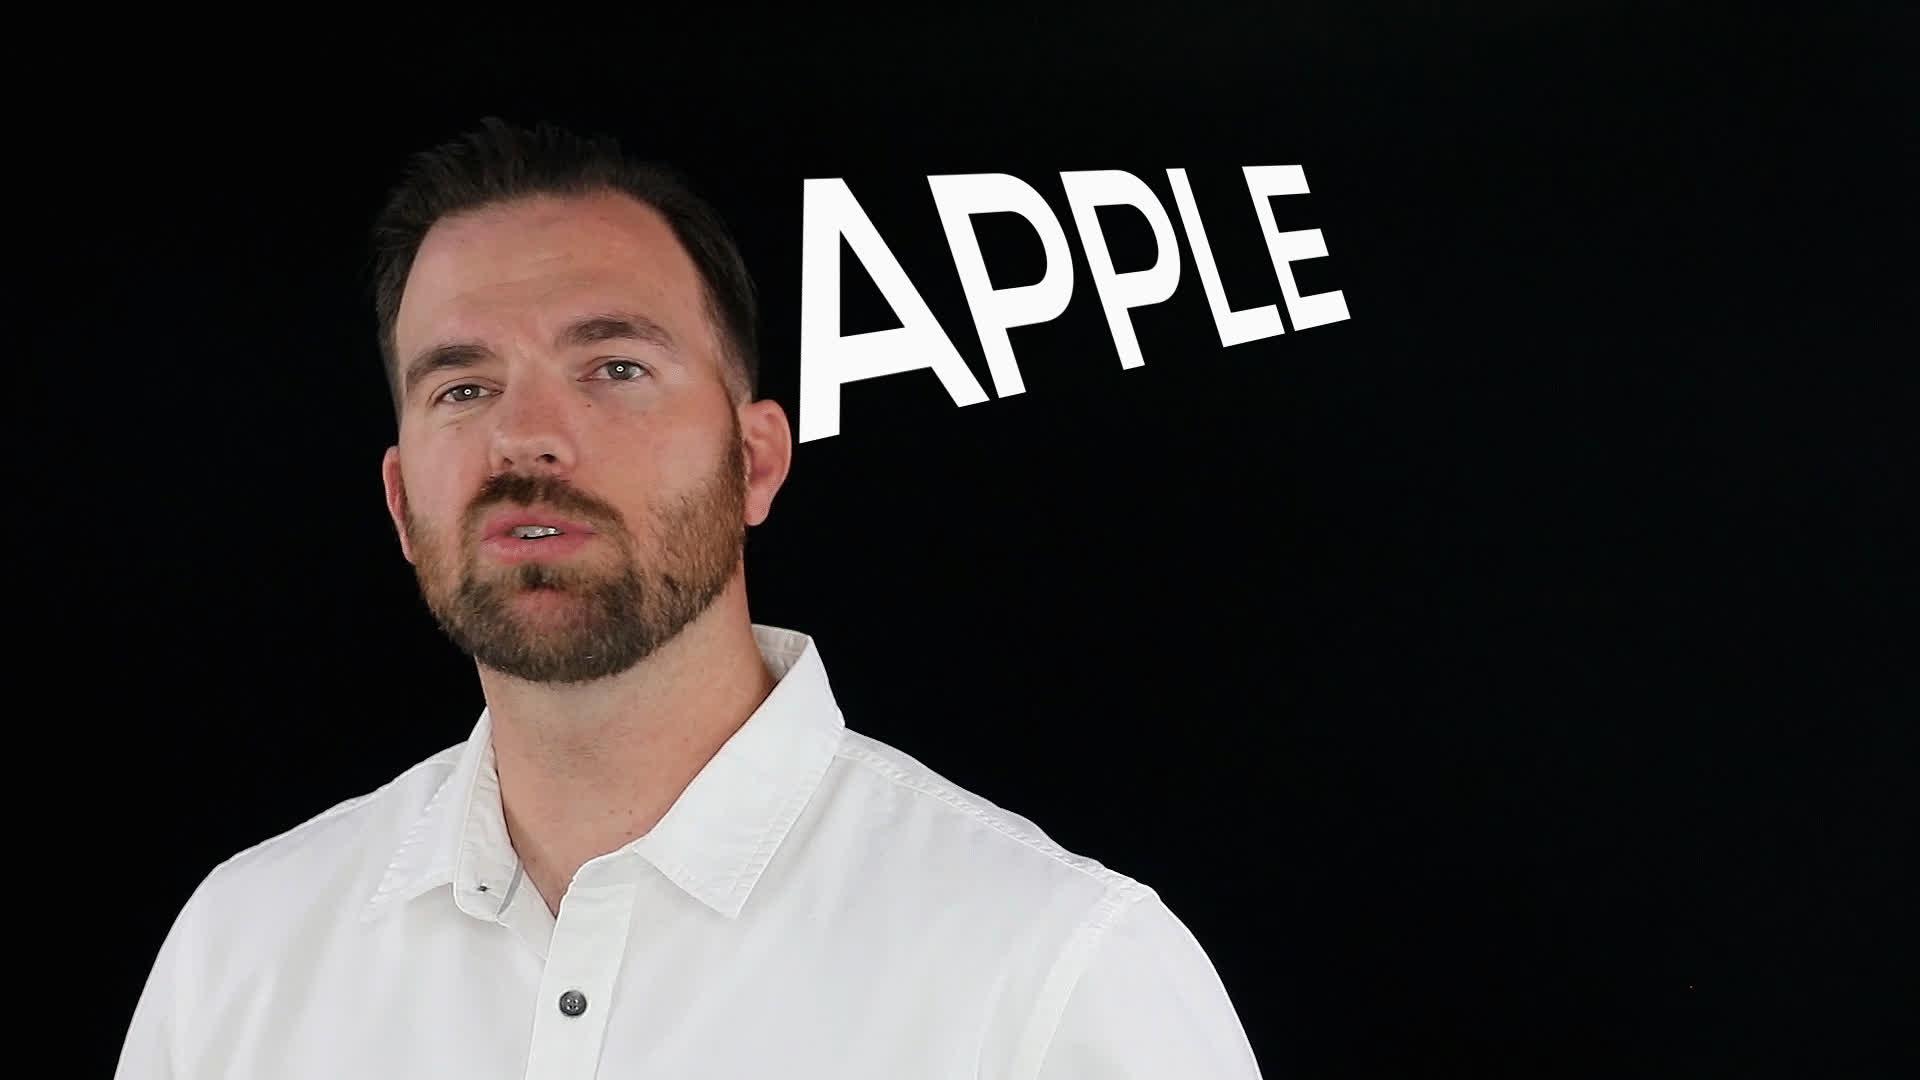 Apple GIFs